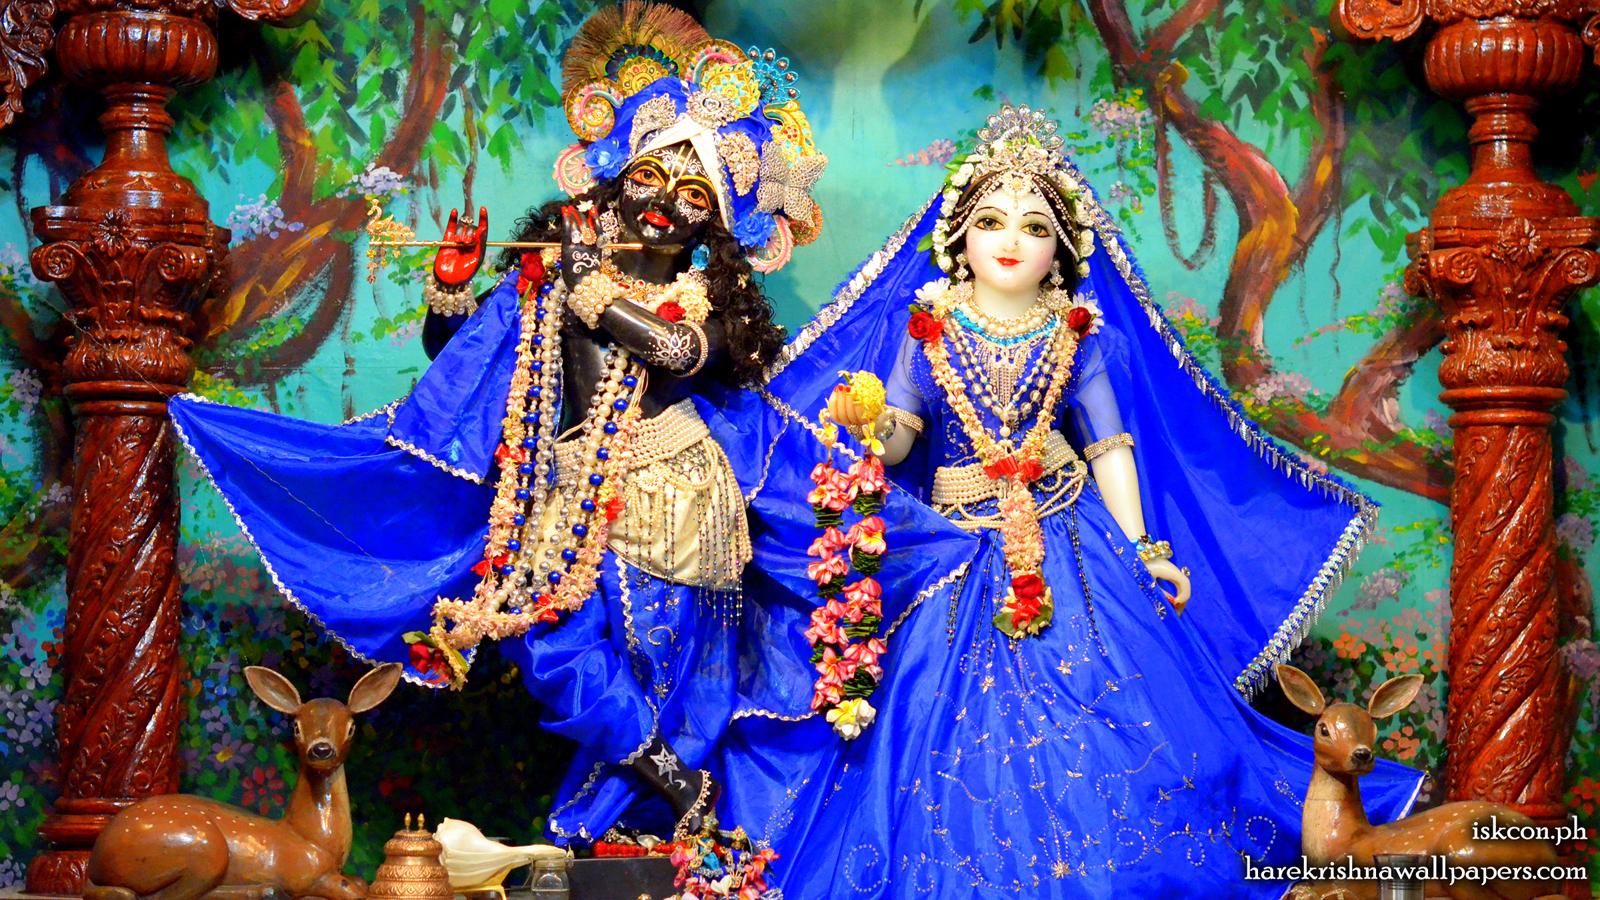 Sri Sri Radha Madhava Wallpaper (016) Size 1600x900 Download